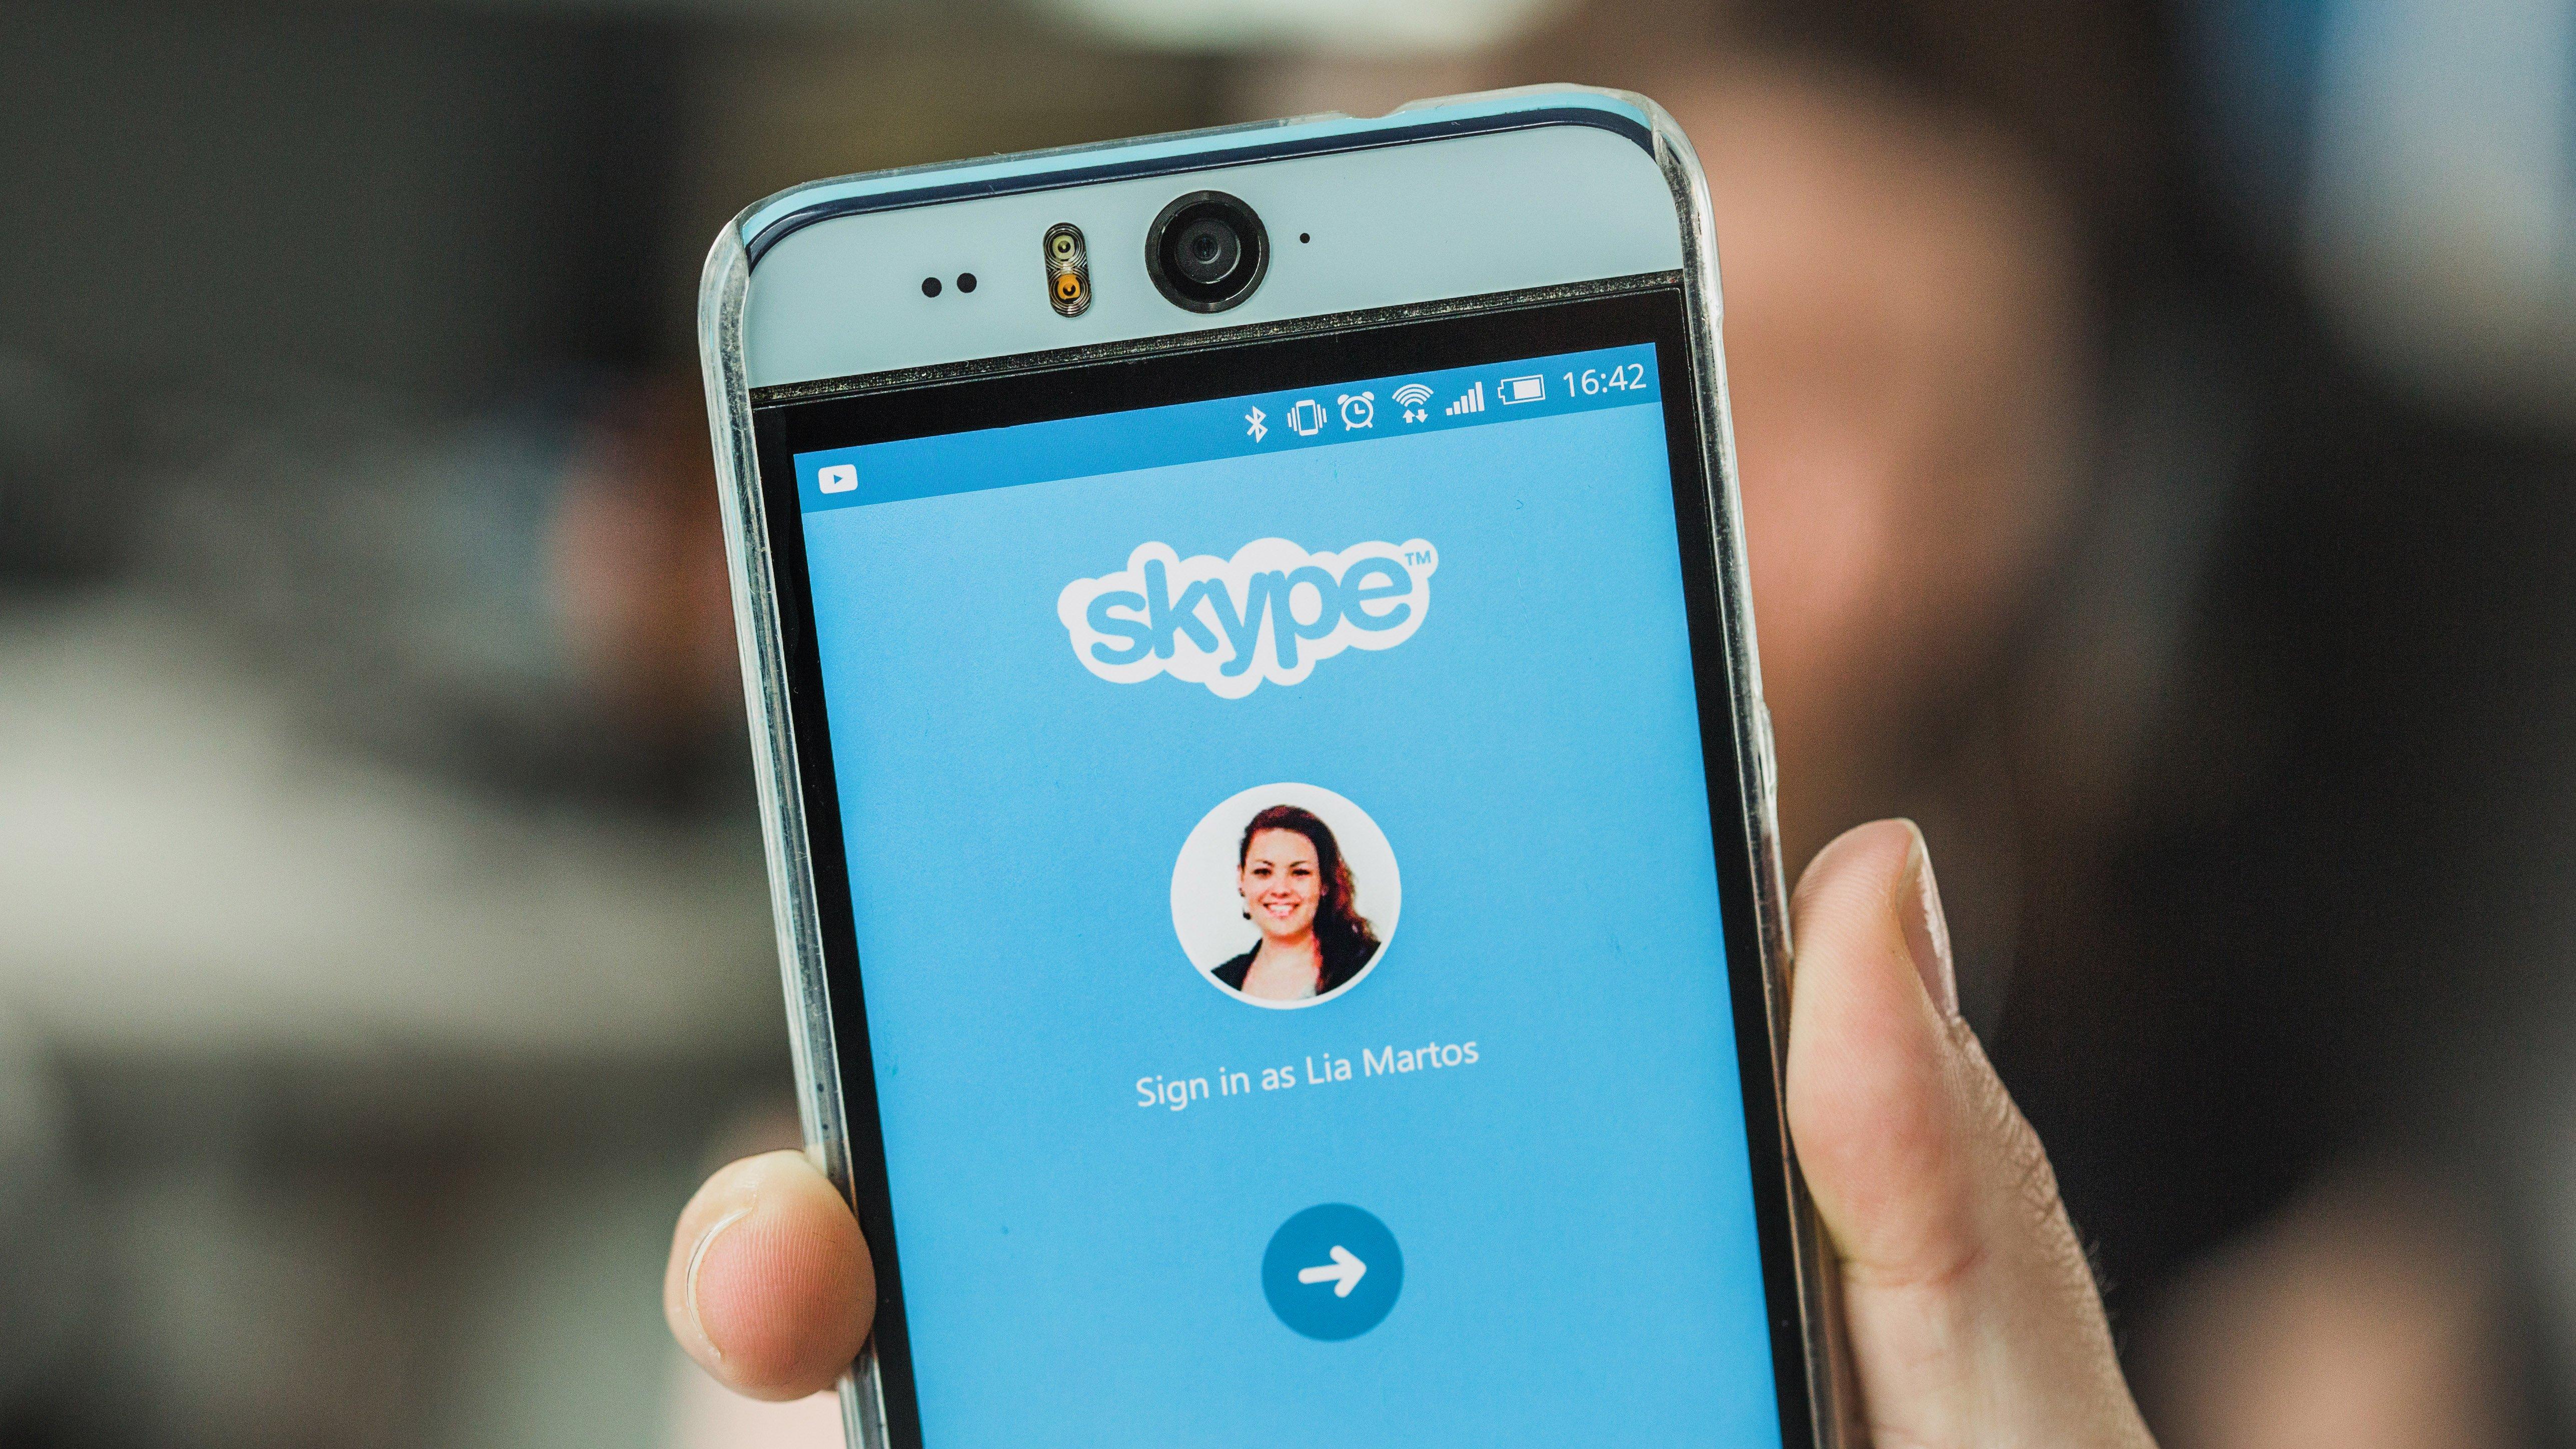 The description of Skype